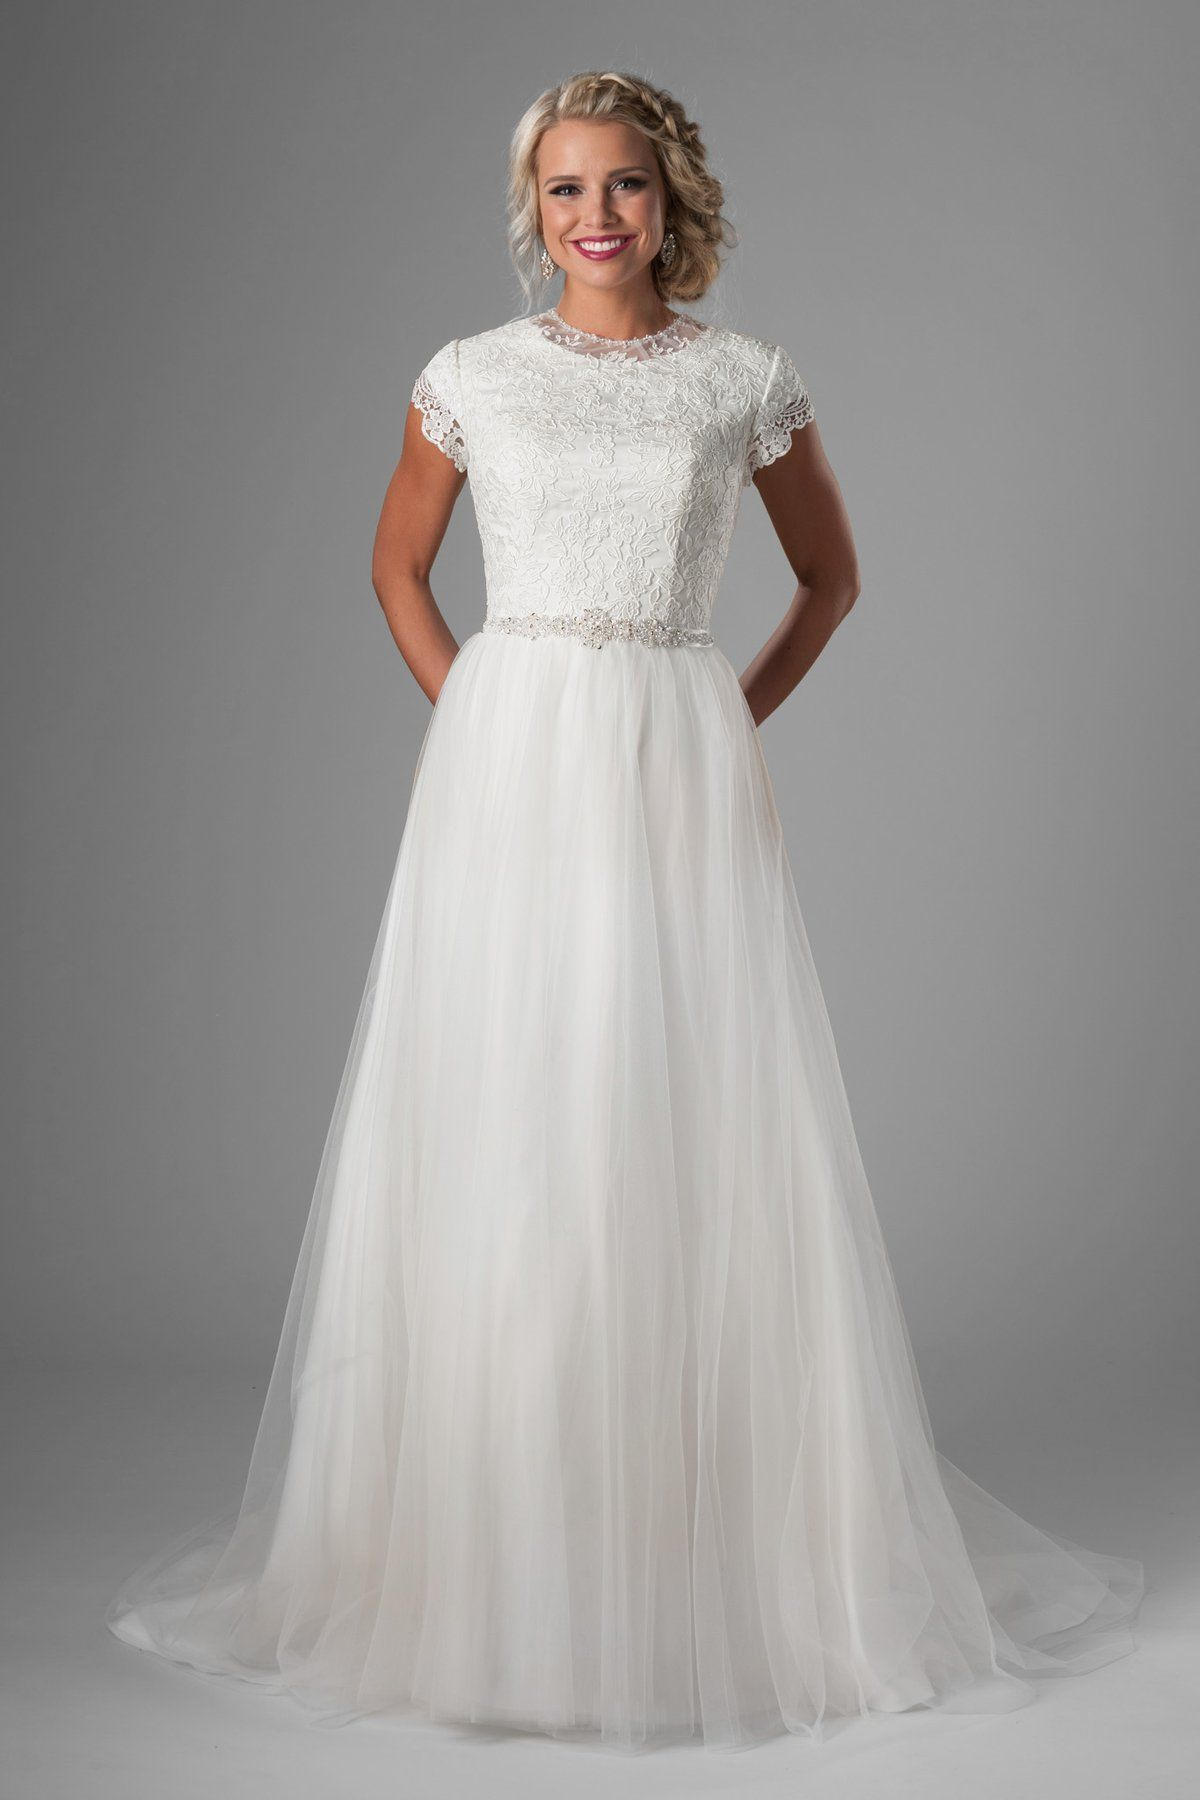 Pennalynn Modest wedding dresses, Wedding dresses simple